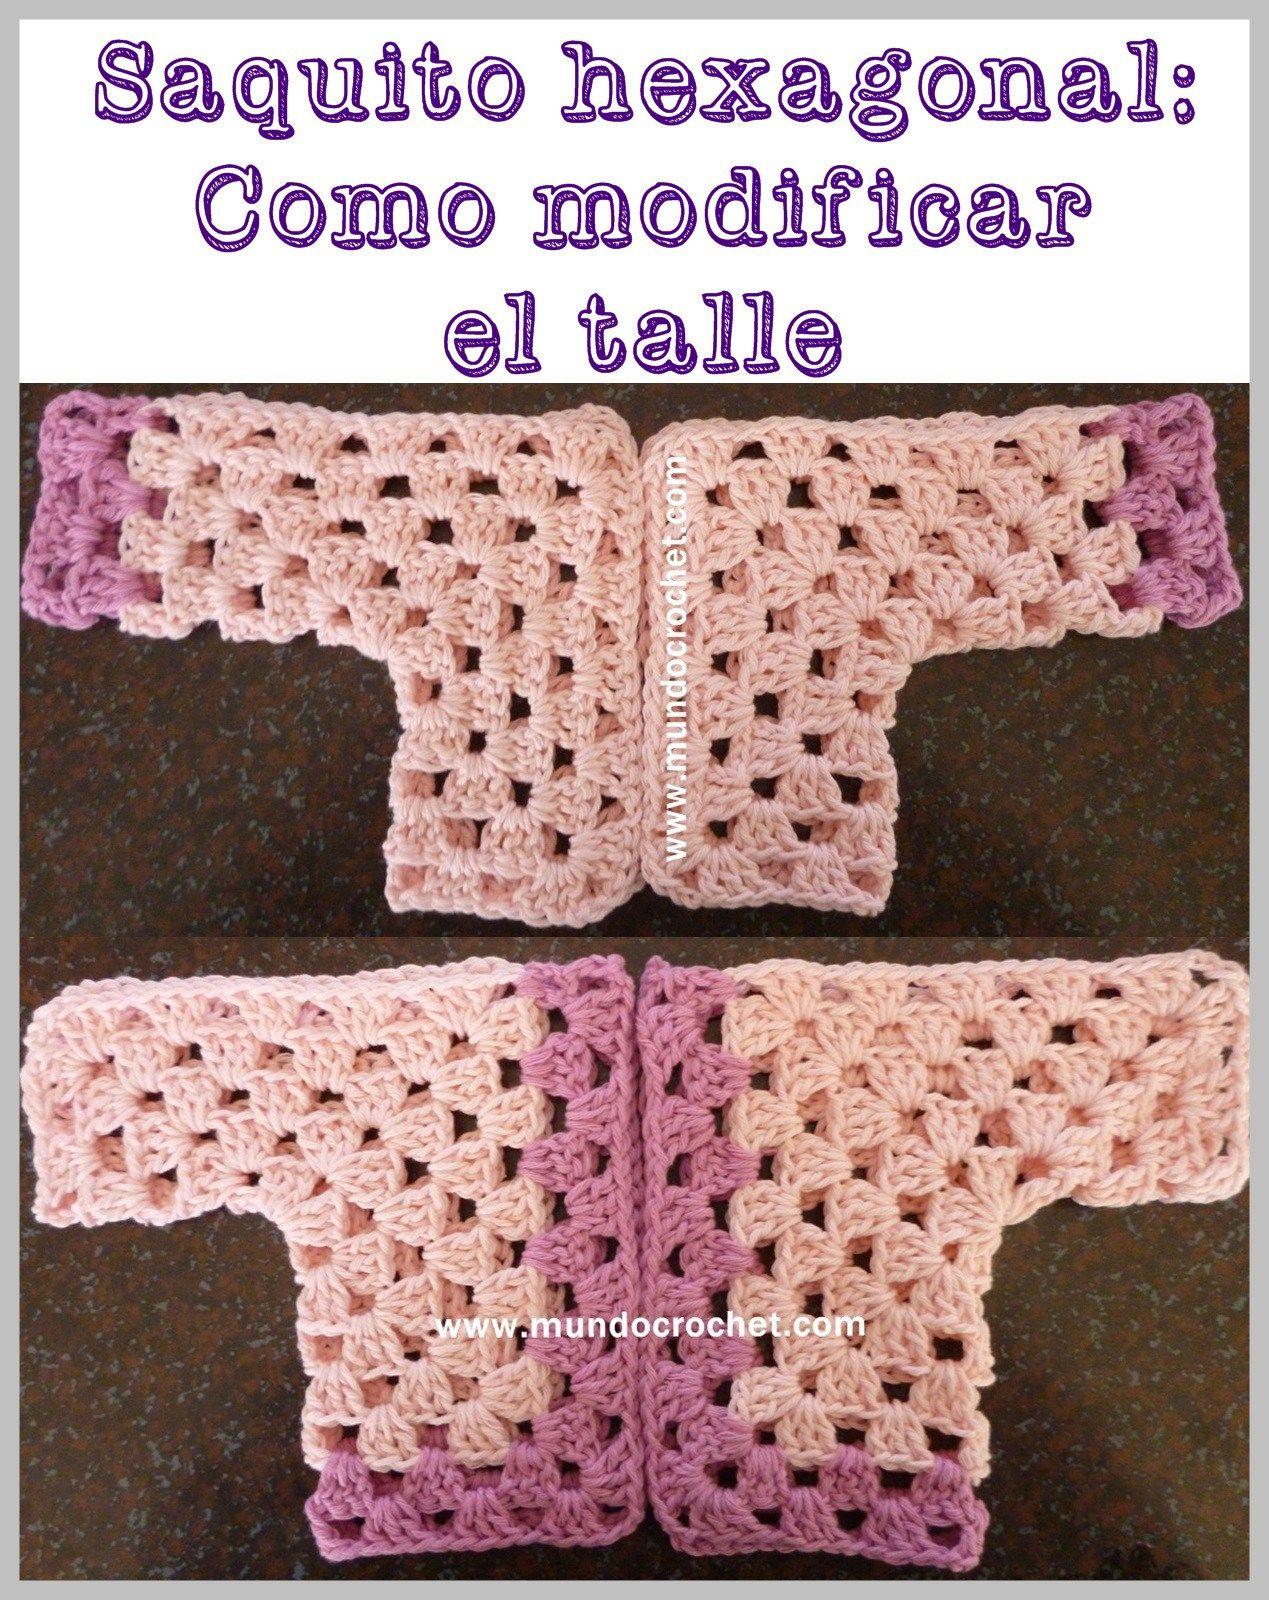 Crochet baby hexagon jacket | Crochet like you don\'t care | Pinterest